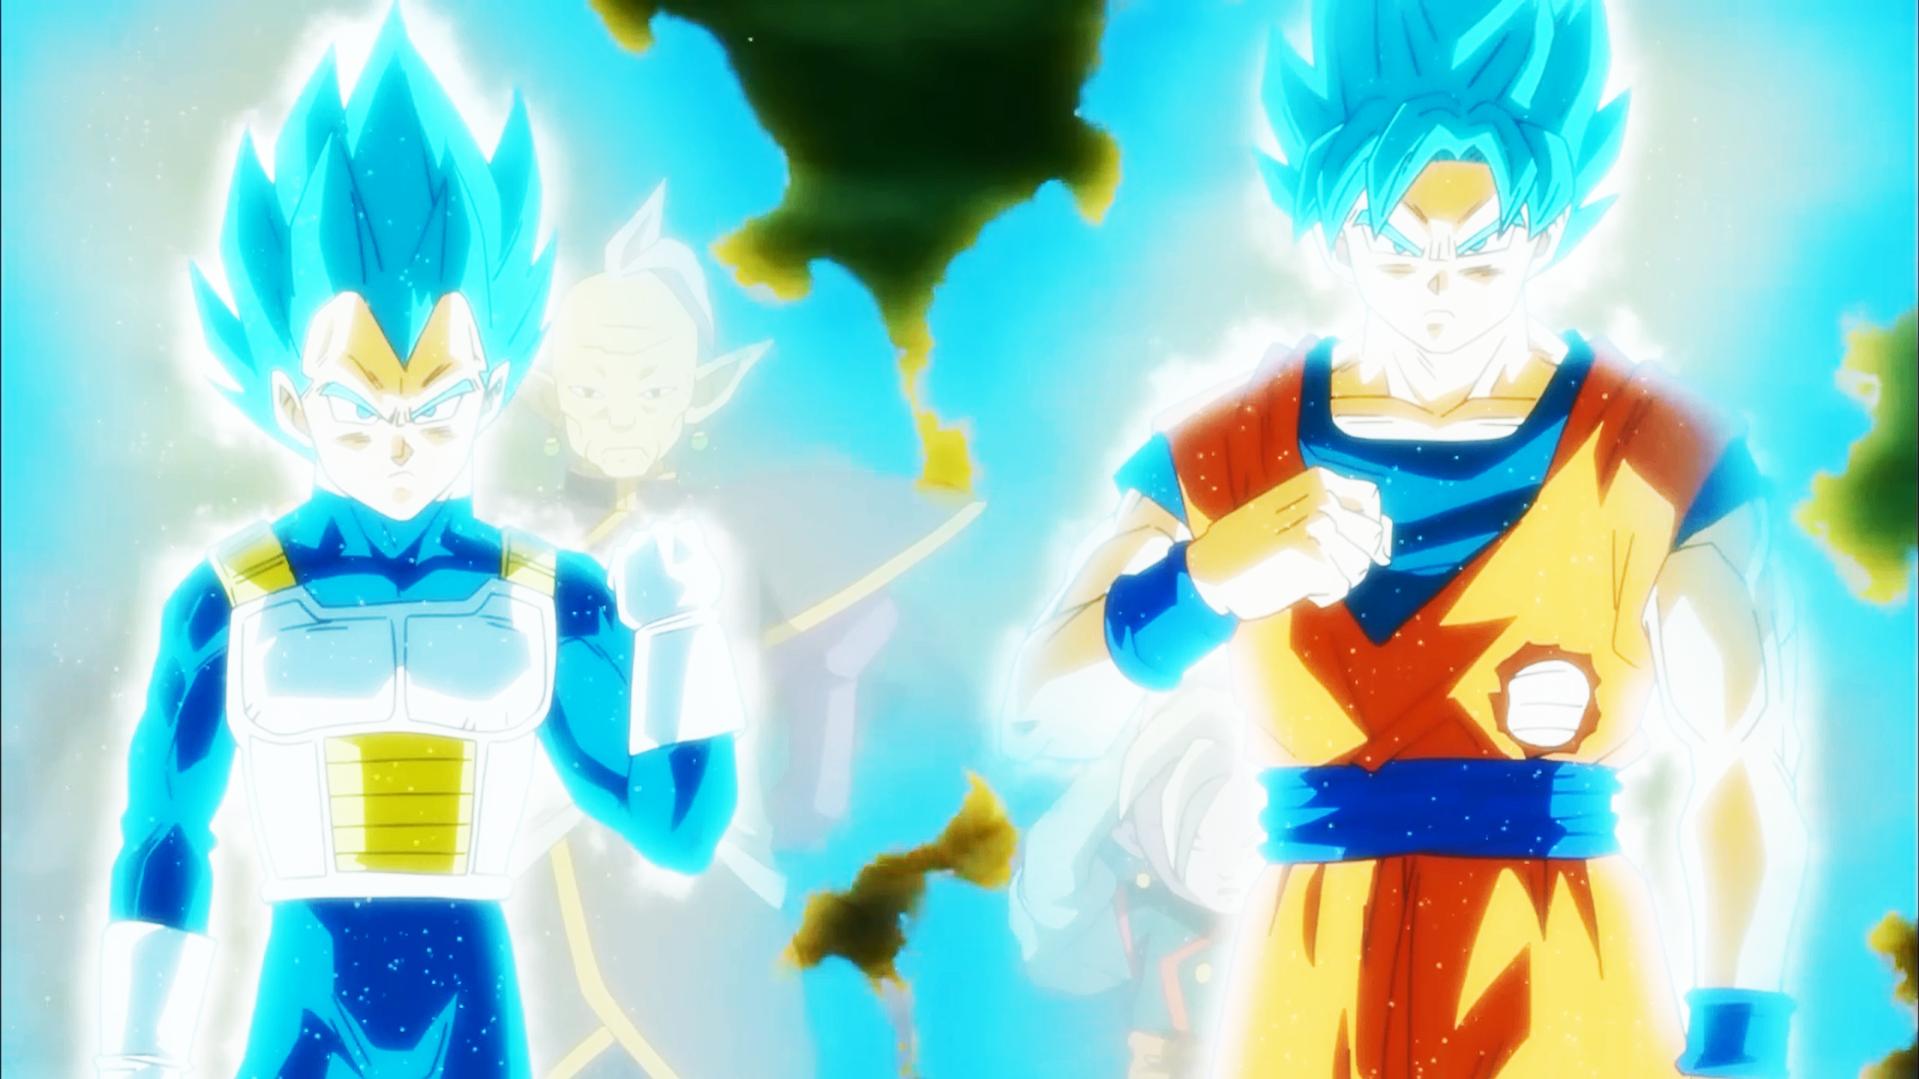 Wallpaper Son Goku Trunks Vegeta Dragon Ball Super Dragon